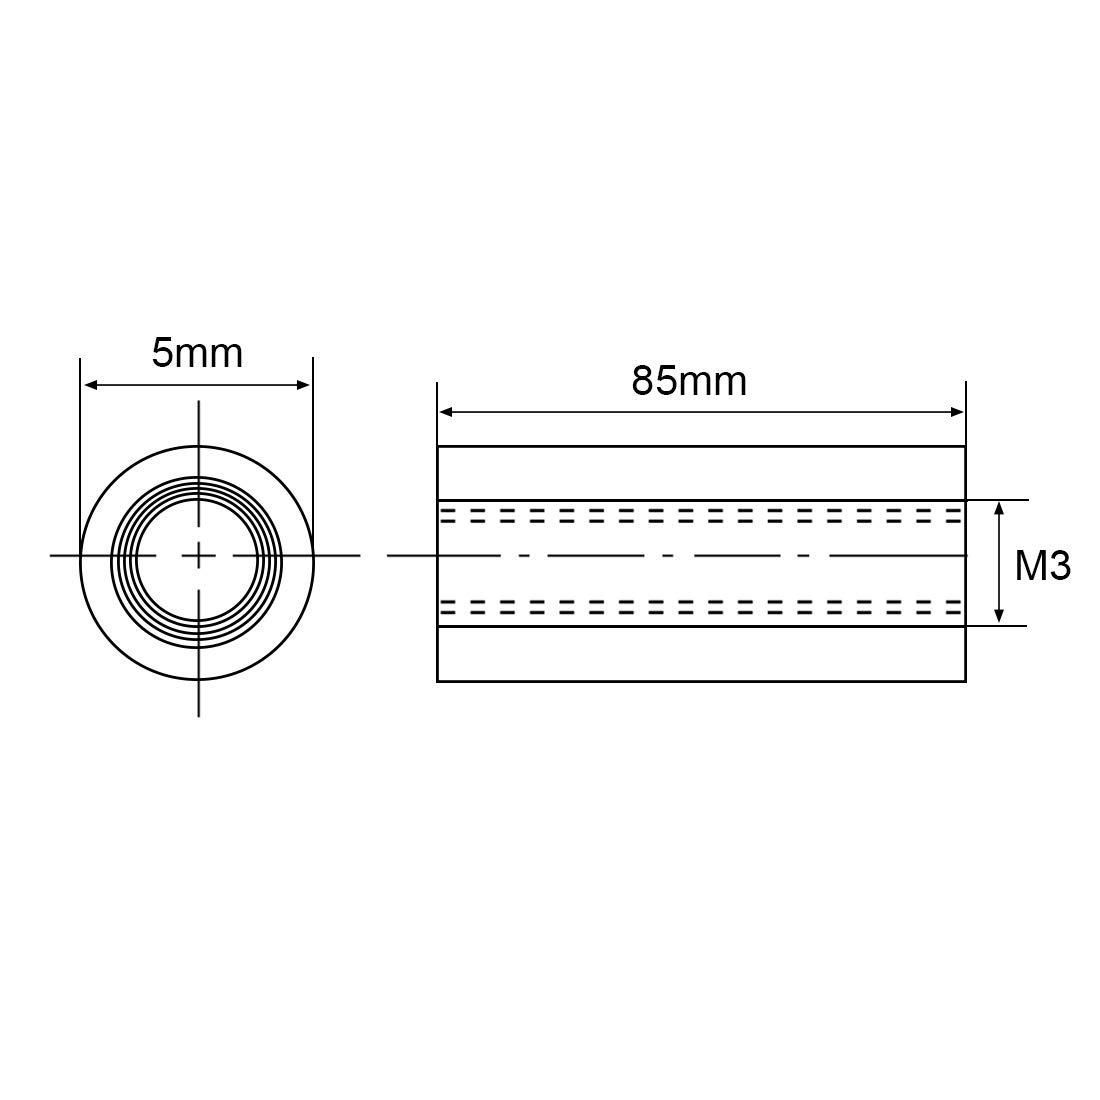 uxcell Round Aluminum Standoff Column Spacer M3x20mm,for RC Airplane,FPV Quadcopter,CNC,Black,10pcs